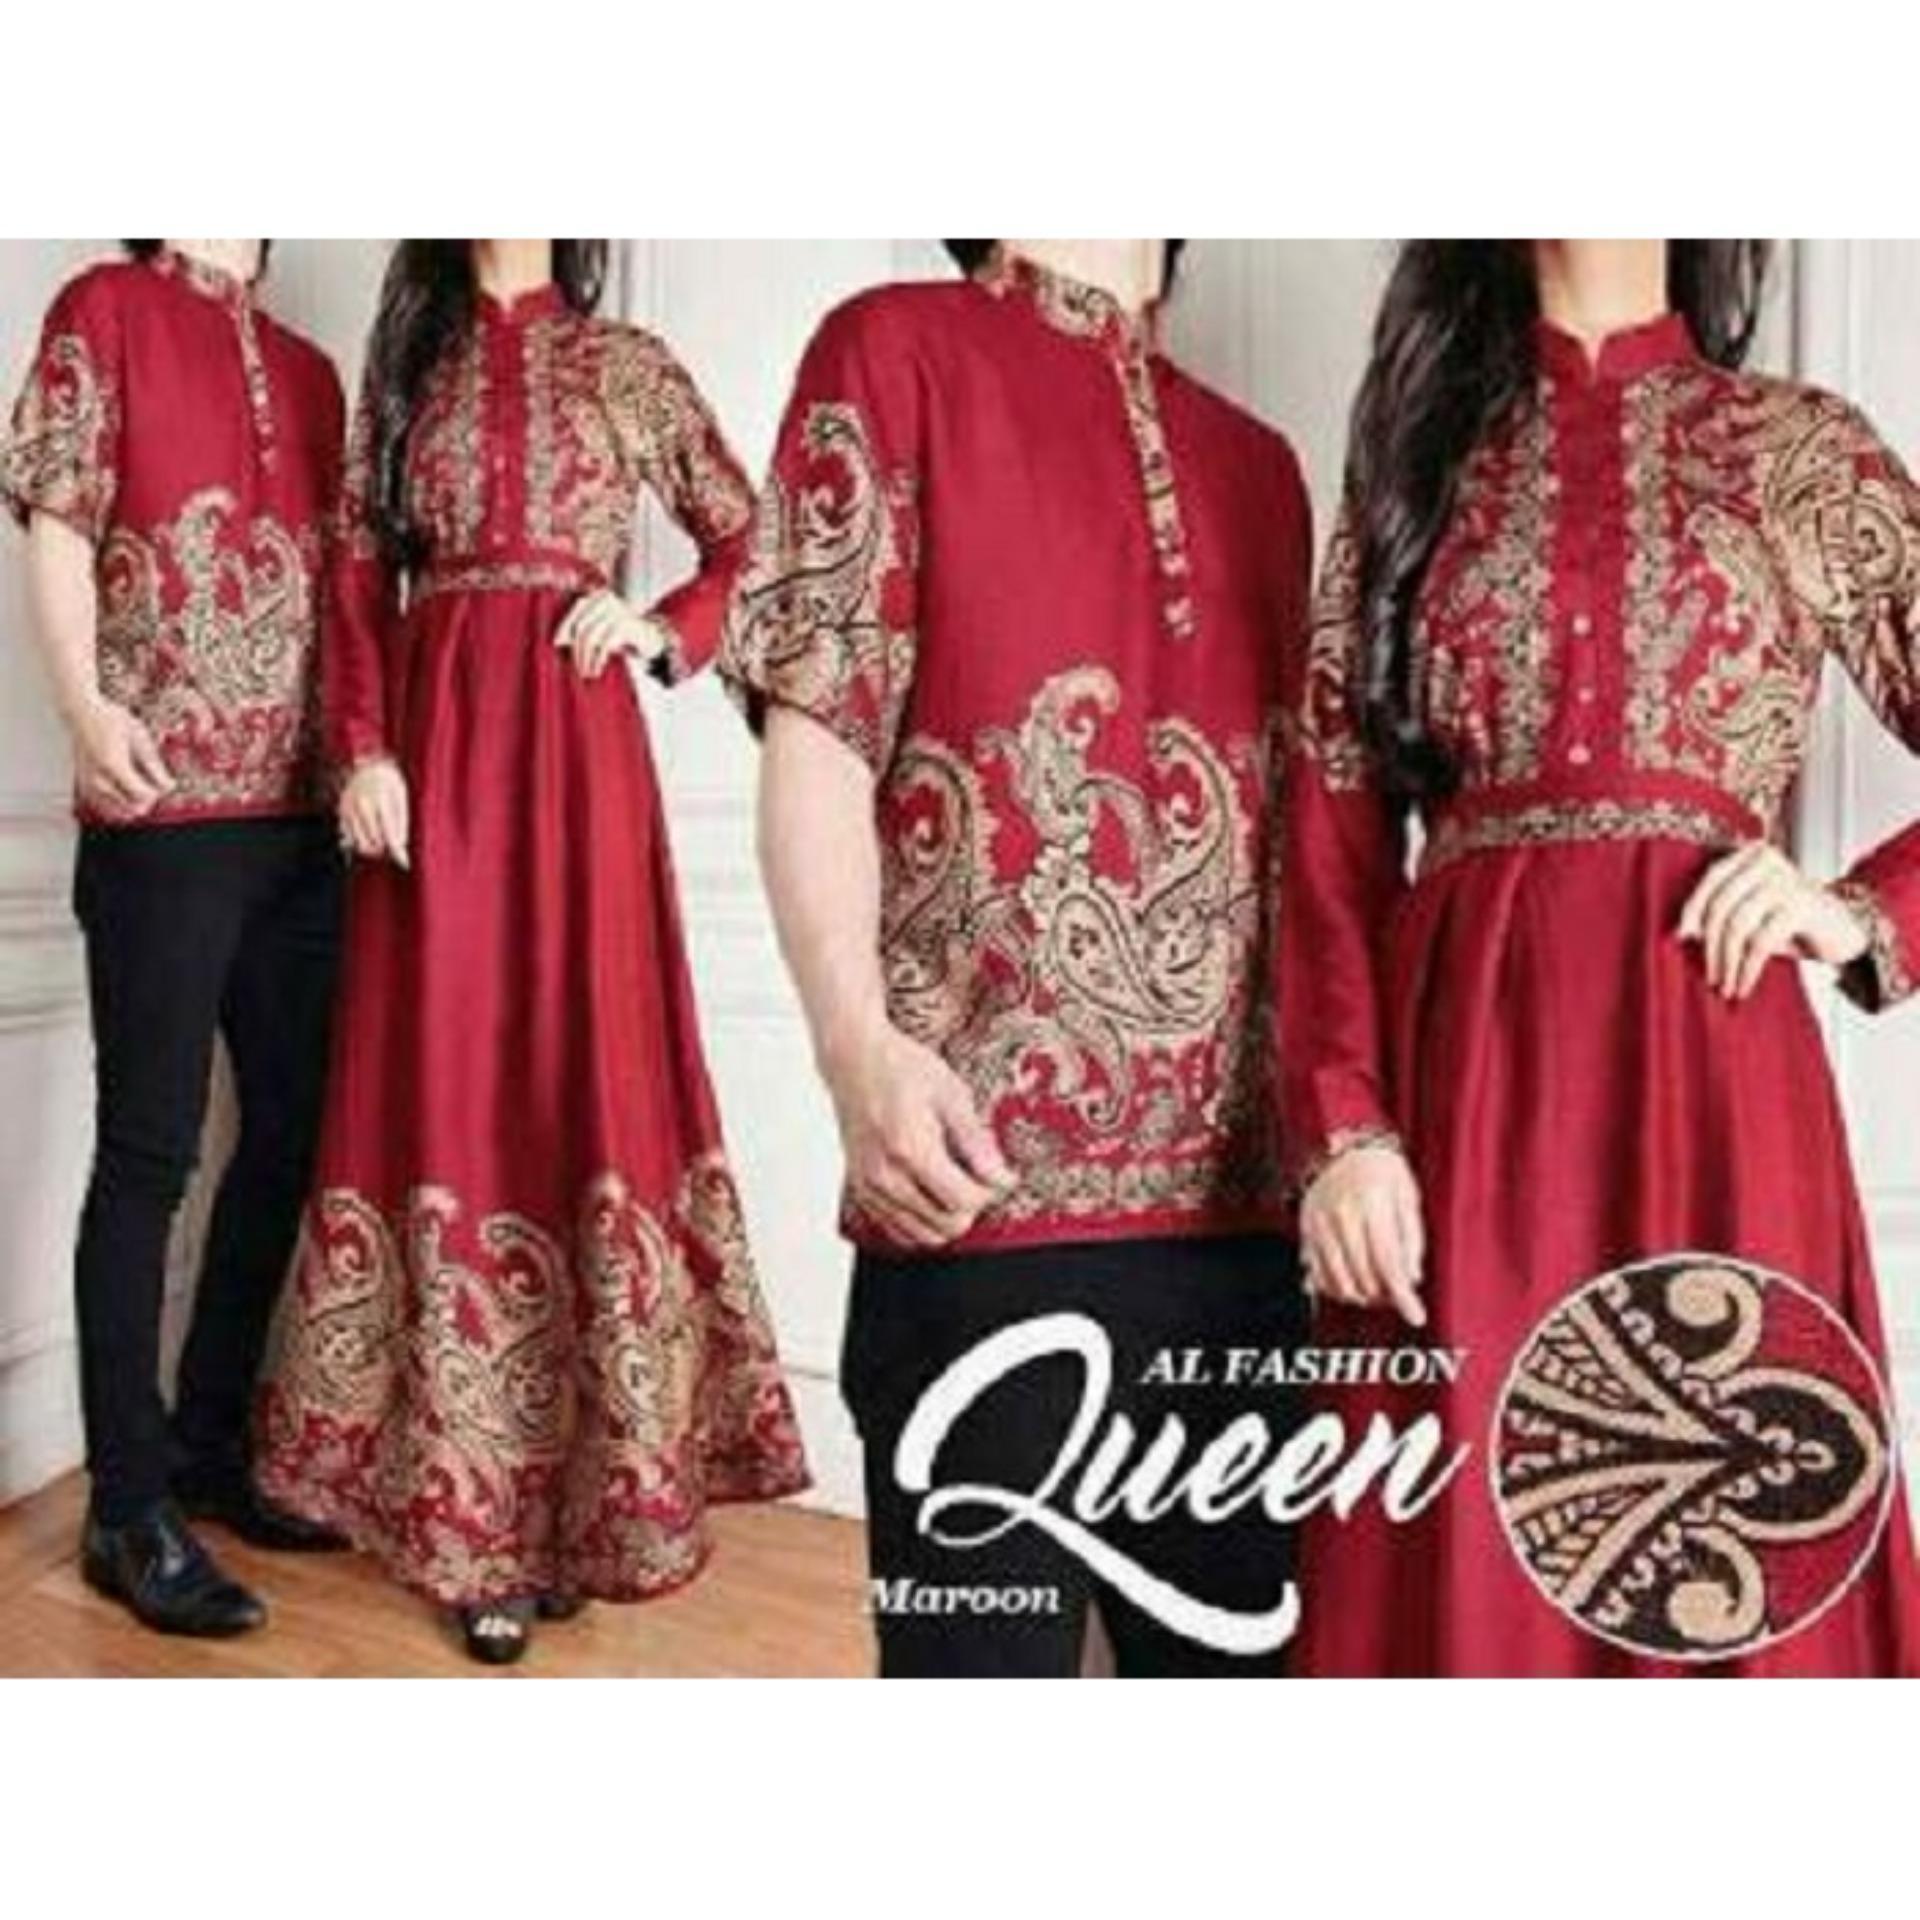 Diskon Pasar Beringharjo Fashion Baju Kemeja Hem Atasan Katun Batik Jarik Warna Online Pakaian Couple Muslim Modern Sarimbit Keluarga Koko Pria Lengan Pendek